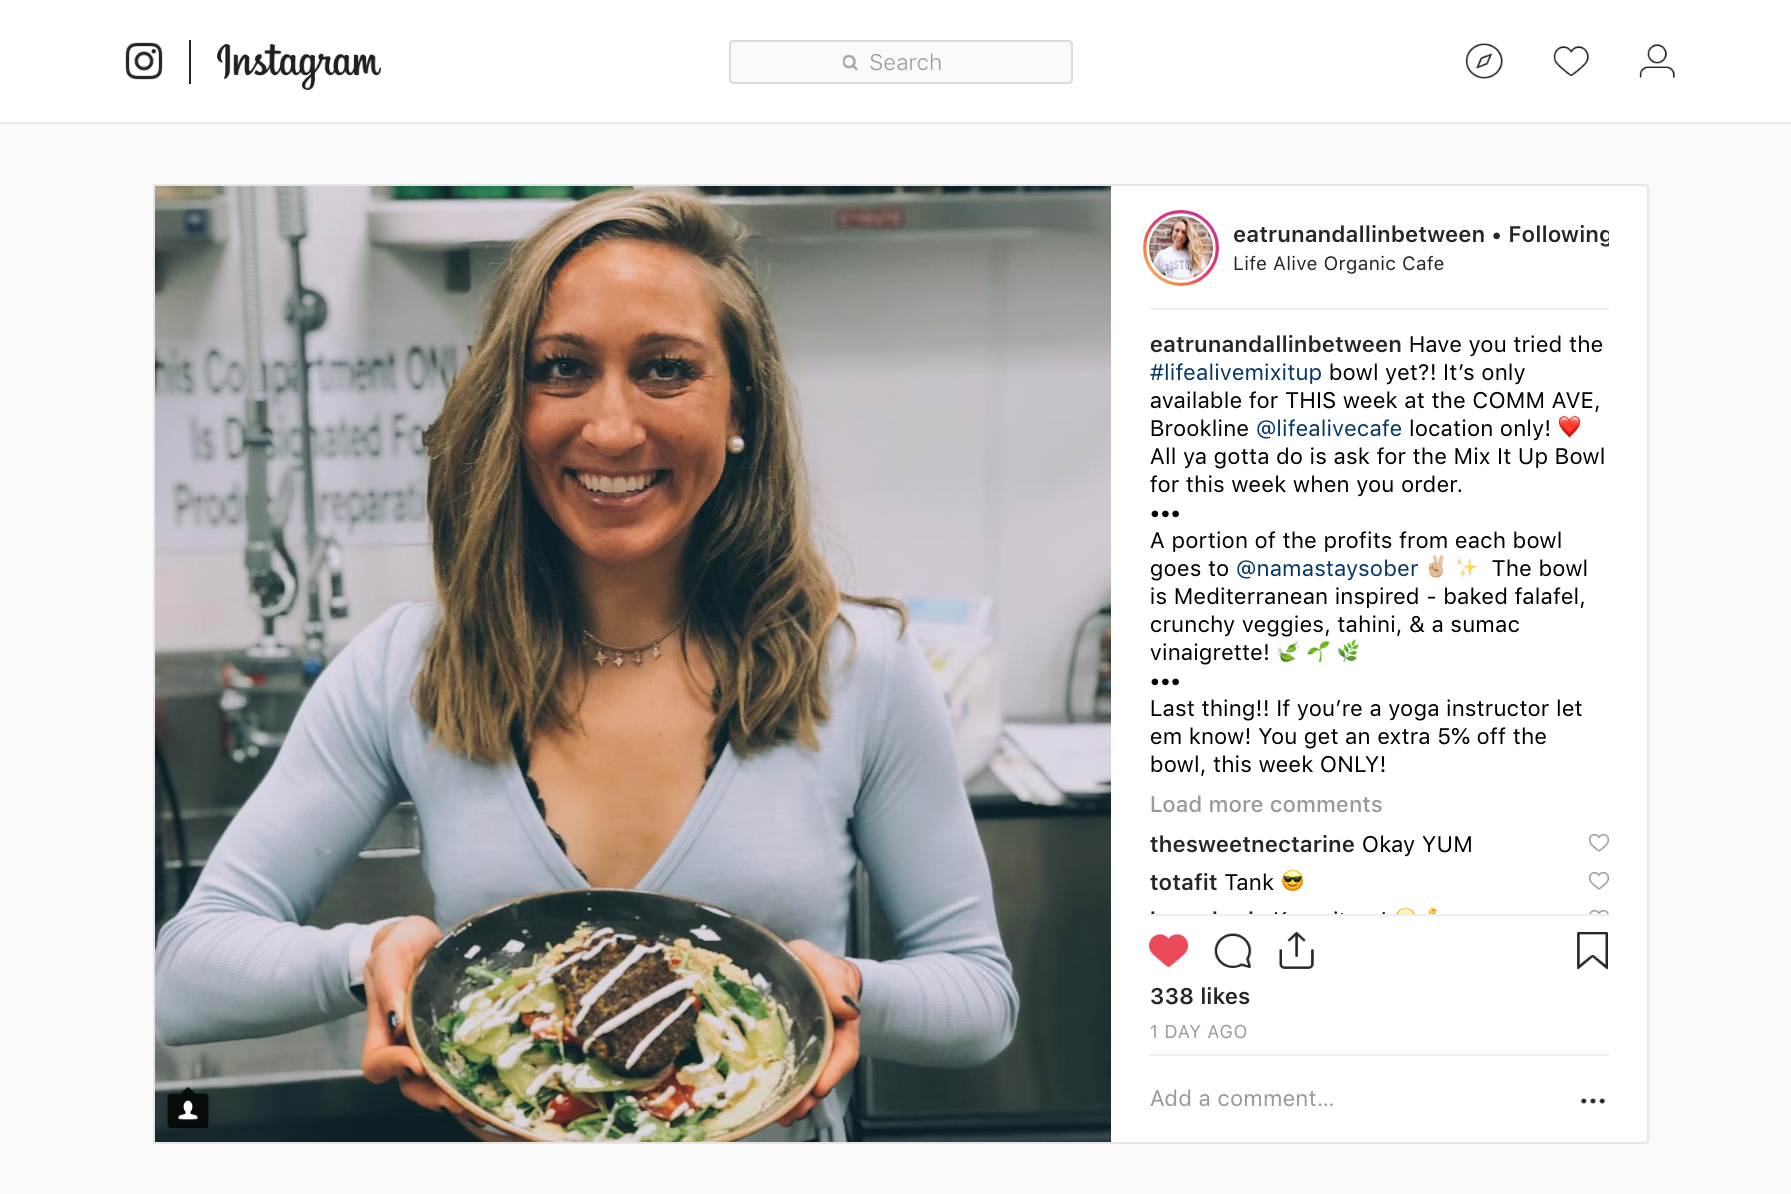 2018.12.05_eatrunandallinbetween, Instagram_Mix It Up_Chapter 3_Life Alive Brookline_cropped 3x2_FAV.png